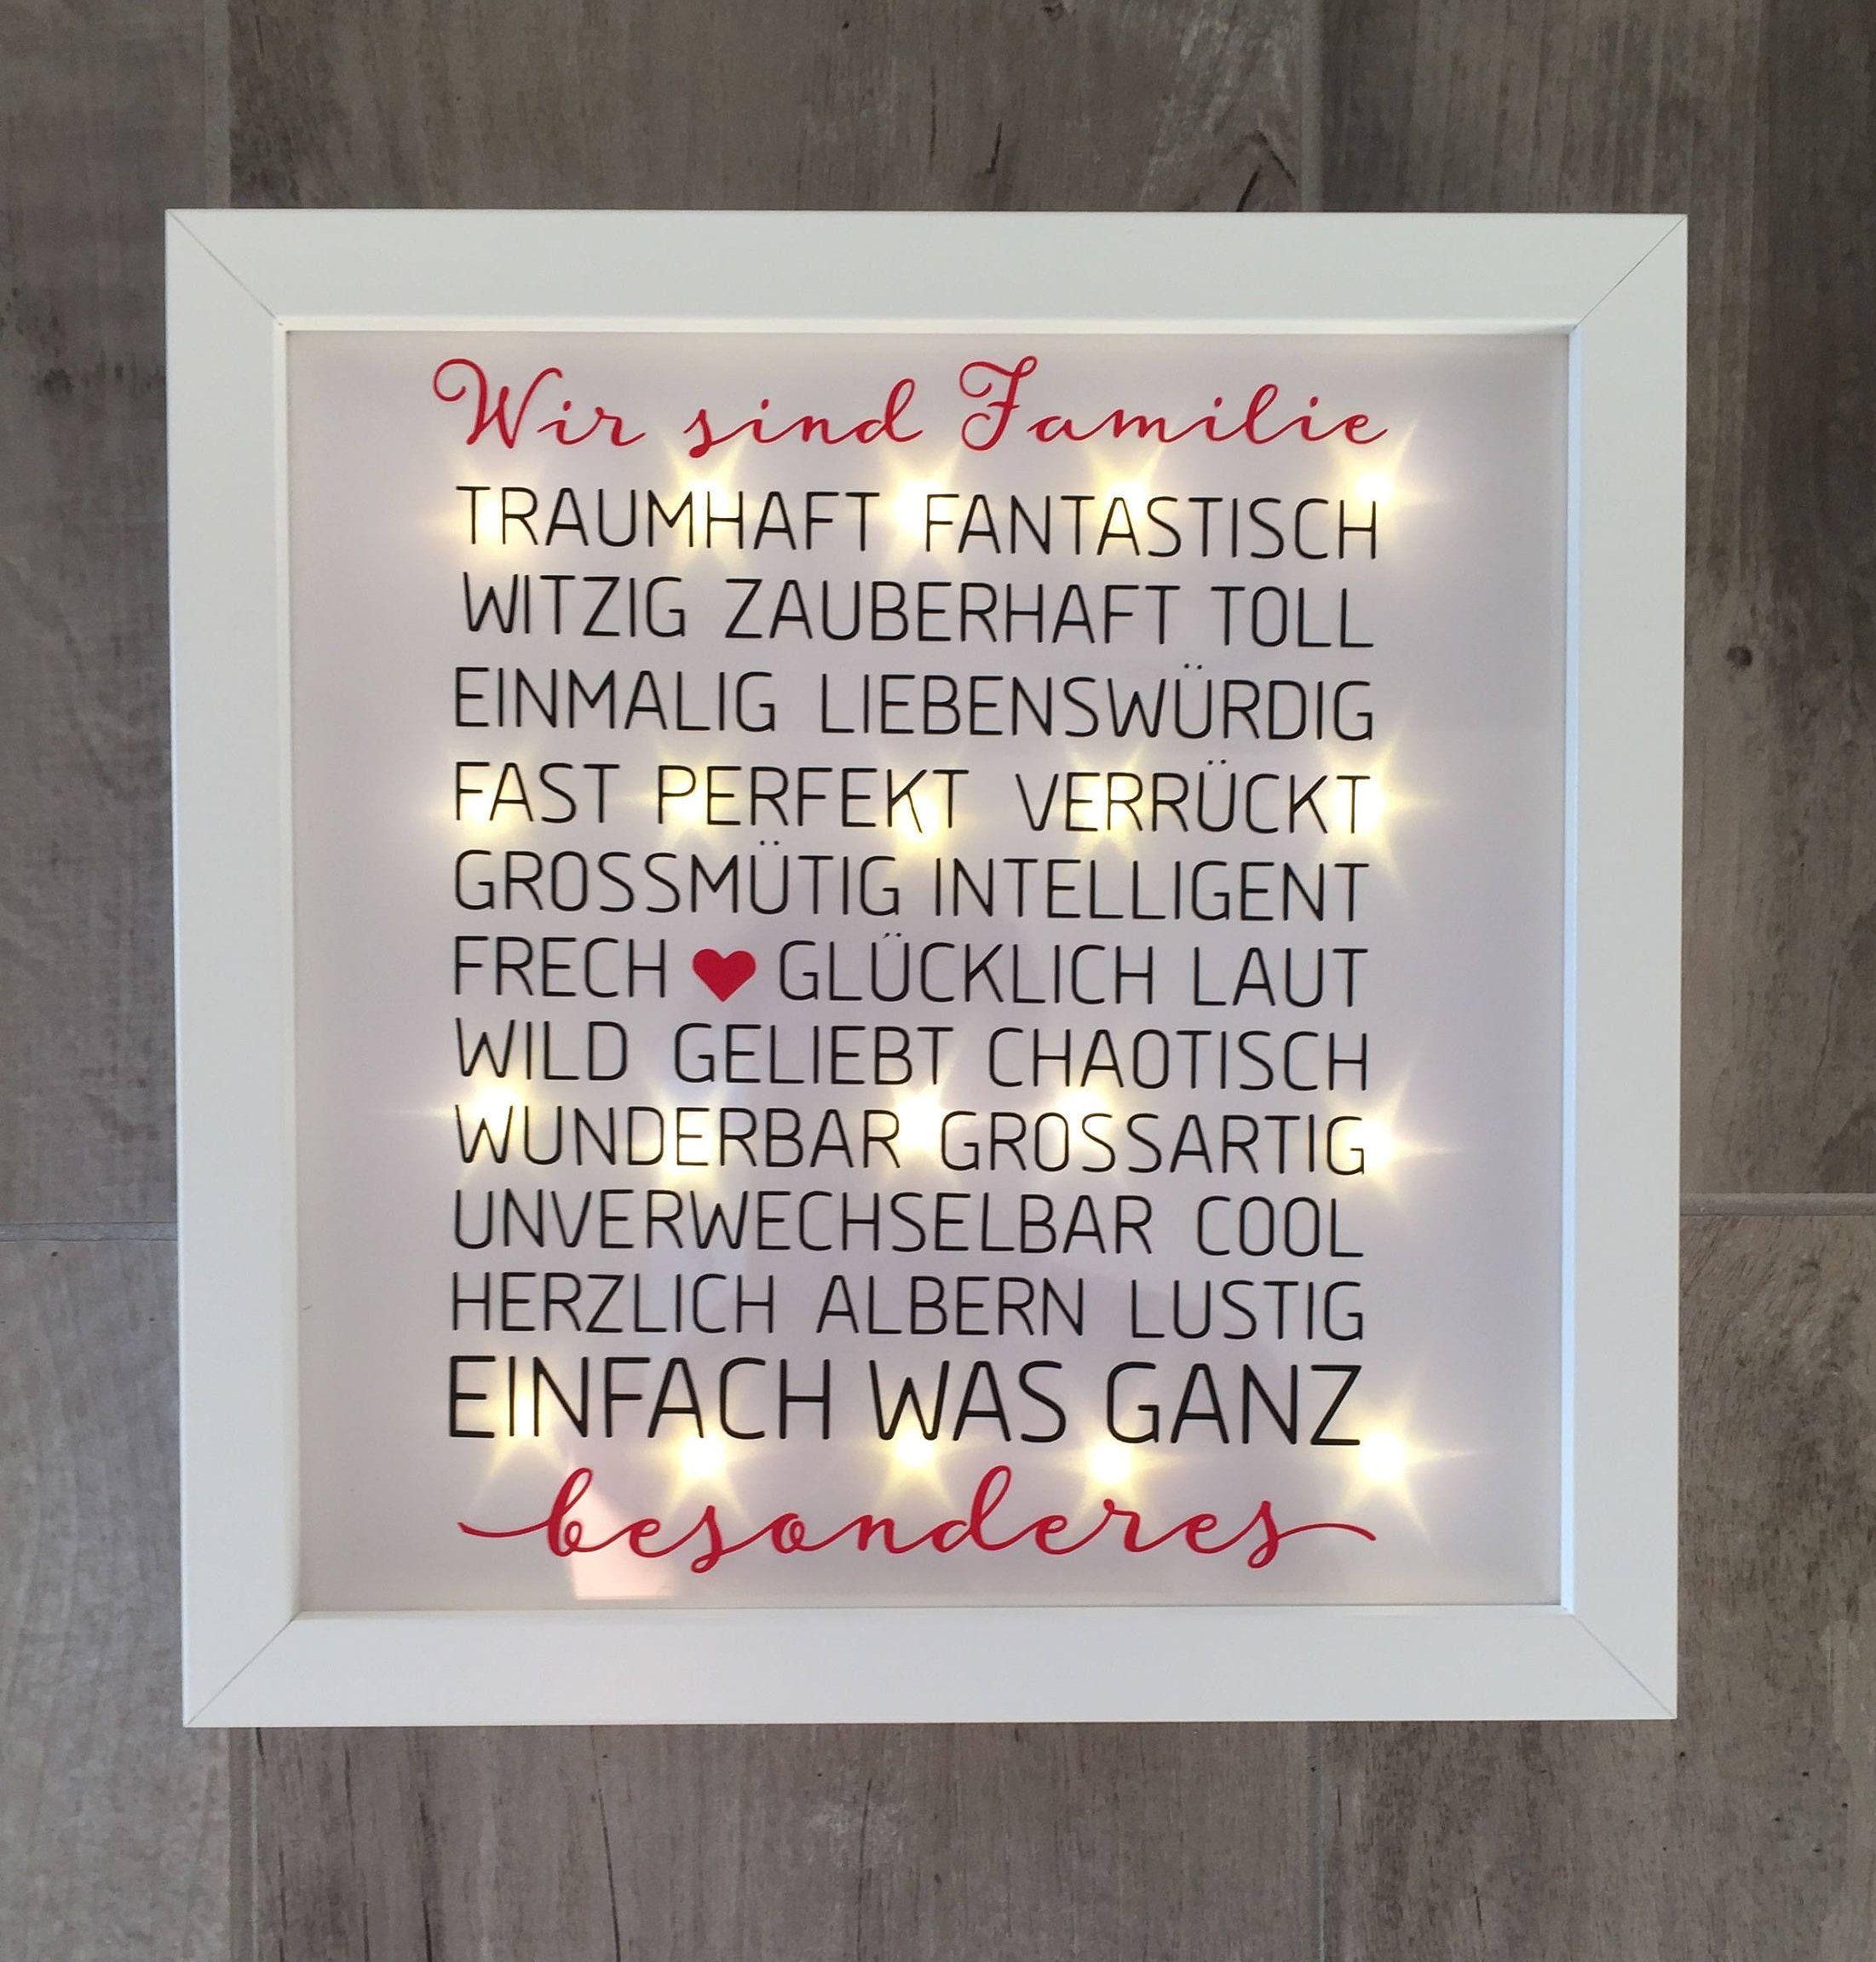 Geschenk Familie Beleuchteter Bilderrahmen Mit Spruch Familie Led Rahmen Wanddeko Gifts For Family Frames On Wall Frame